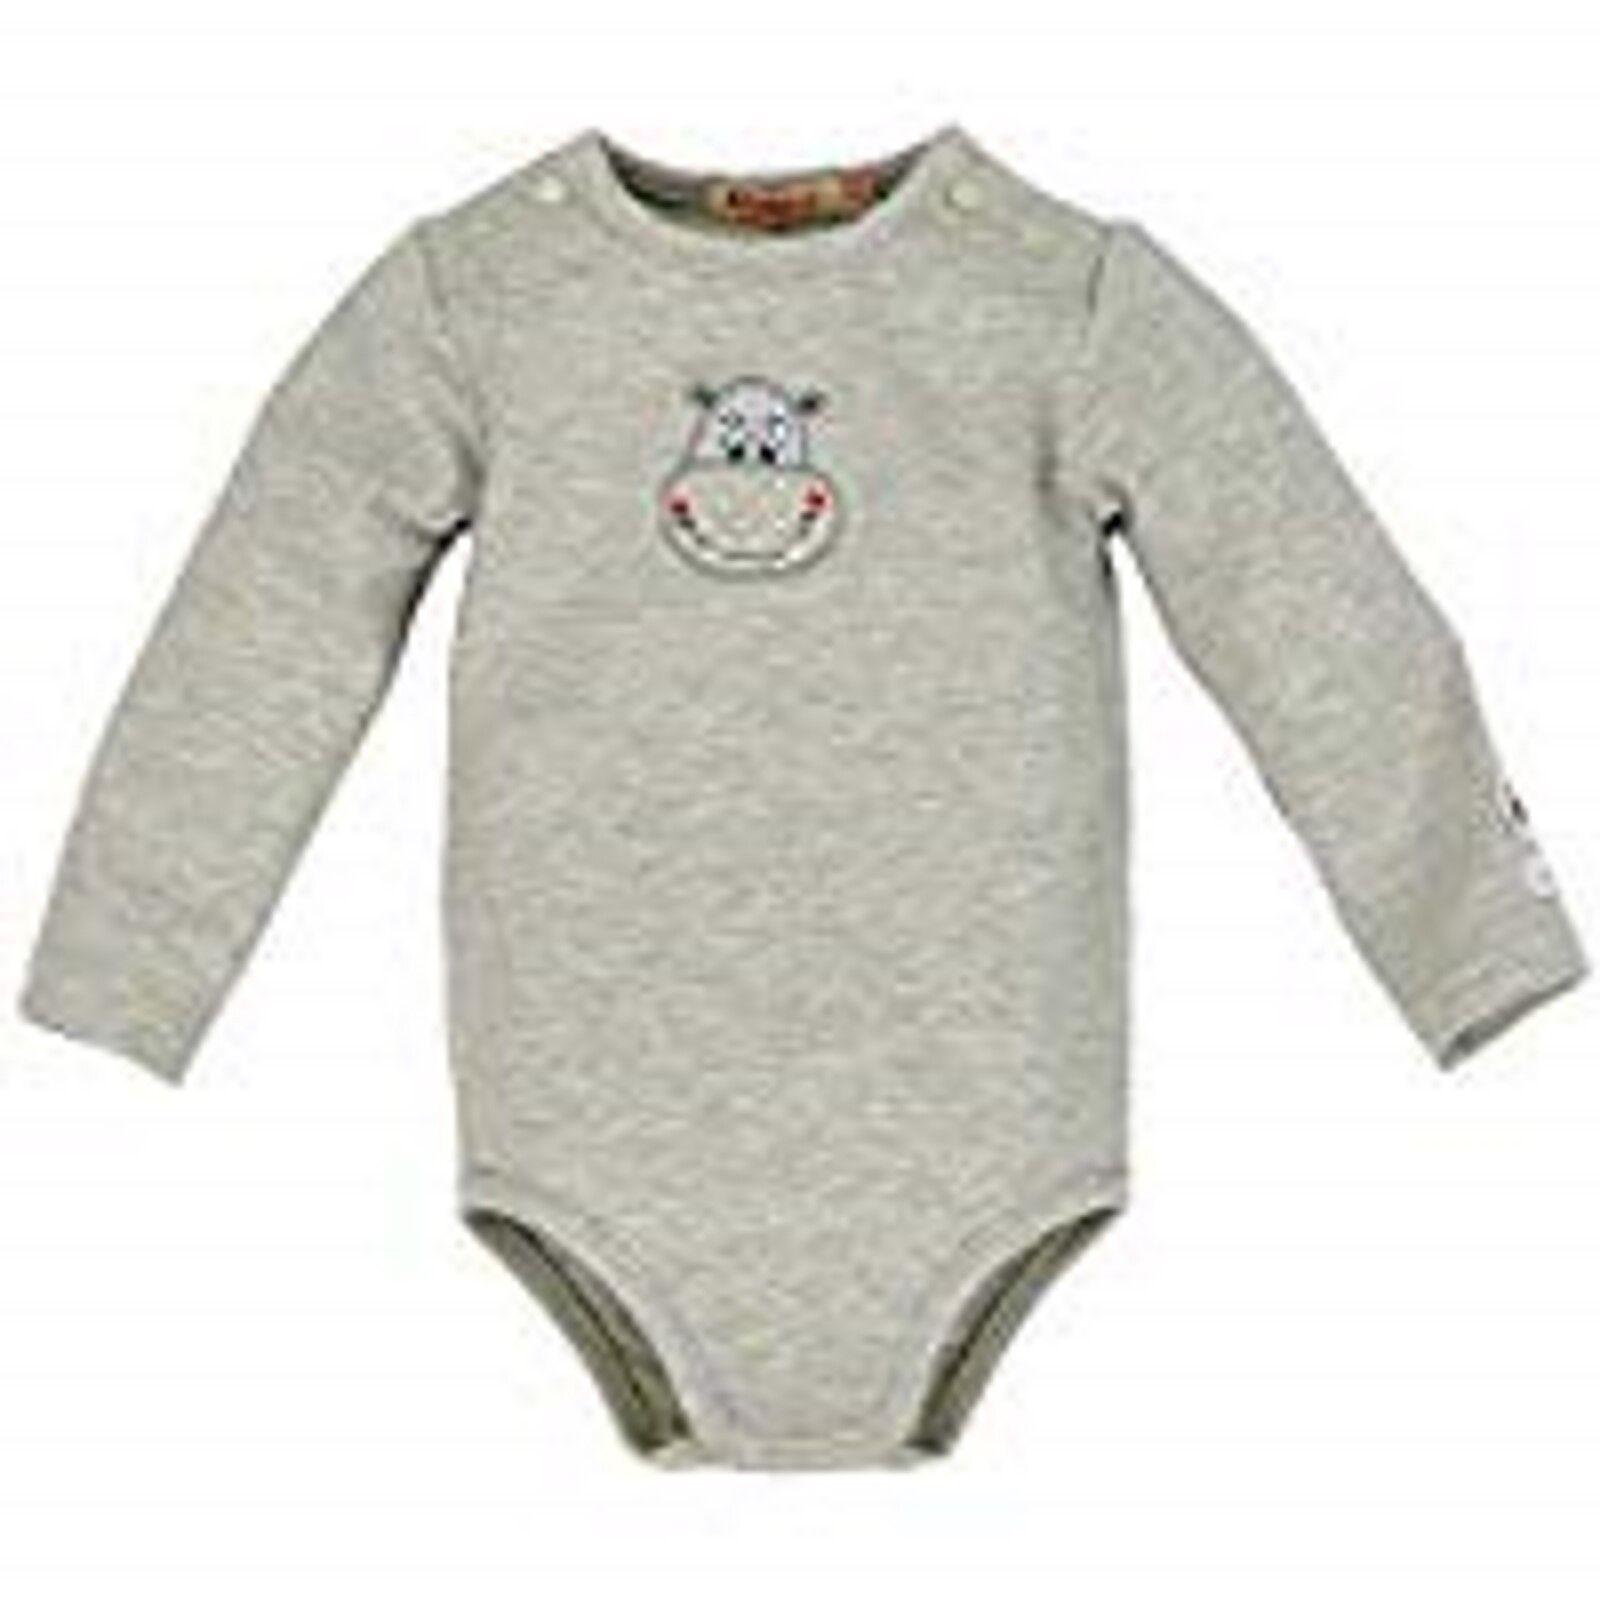 Bondi Body Baby Jungen Mädchen Langarm HiPPo Grau Gr. 56 62 68 74 80 NeU